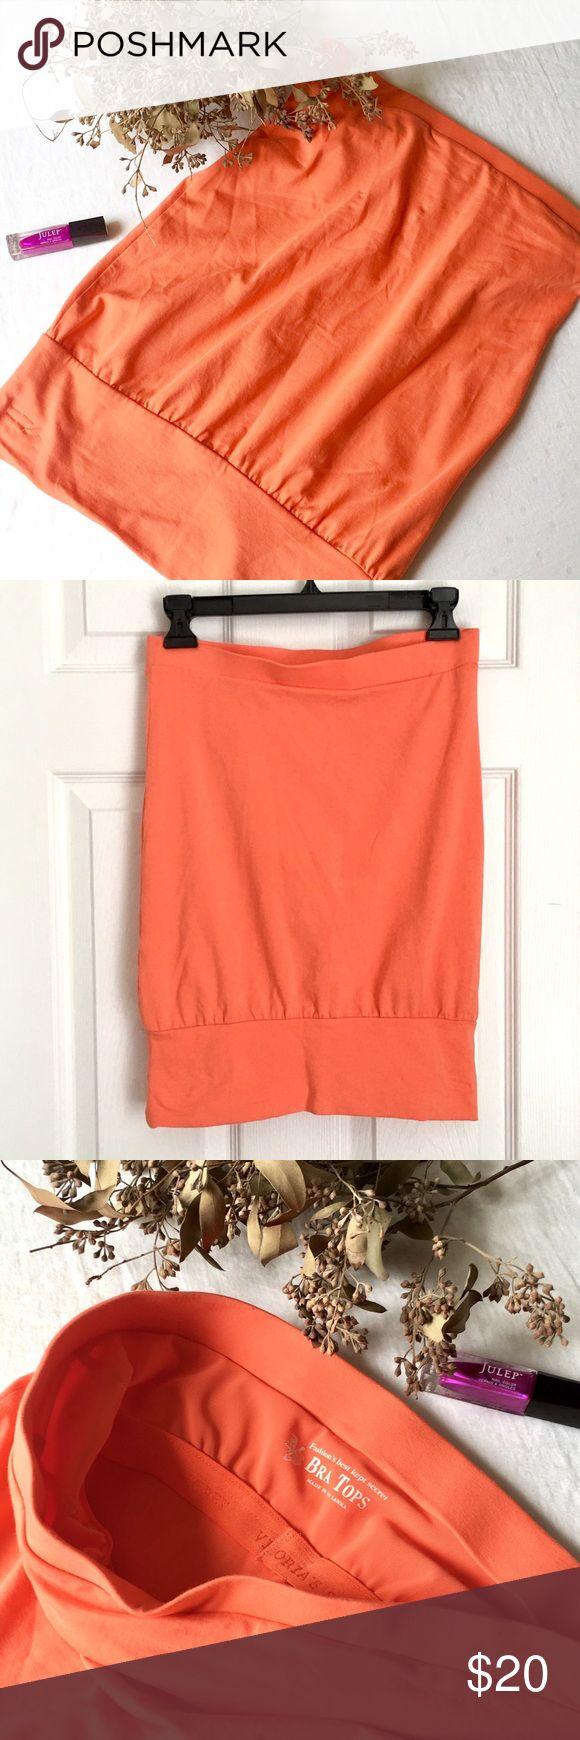 VS Bandeau Bra Top in Orange Sherbet! XS Victoria's Secret Bra Tops XS Bandeau in Orange Sherbet! So comfy and cute! Made in Sri Lanka. Victoria's Secret Tops